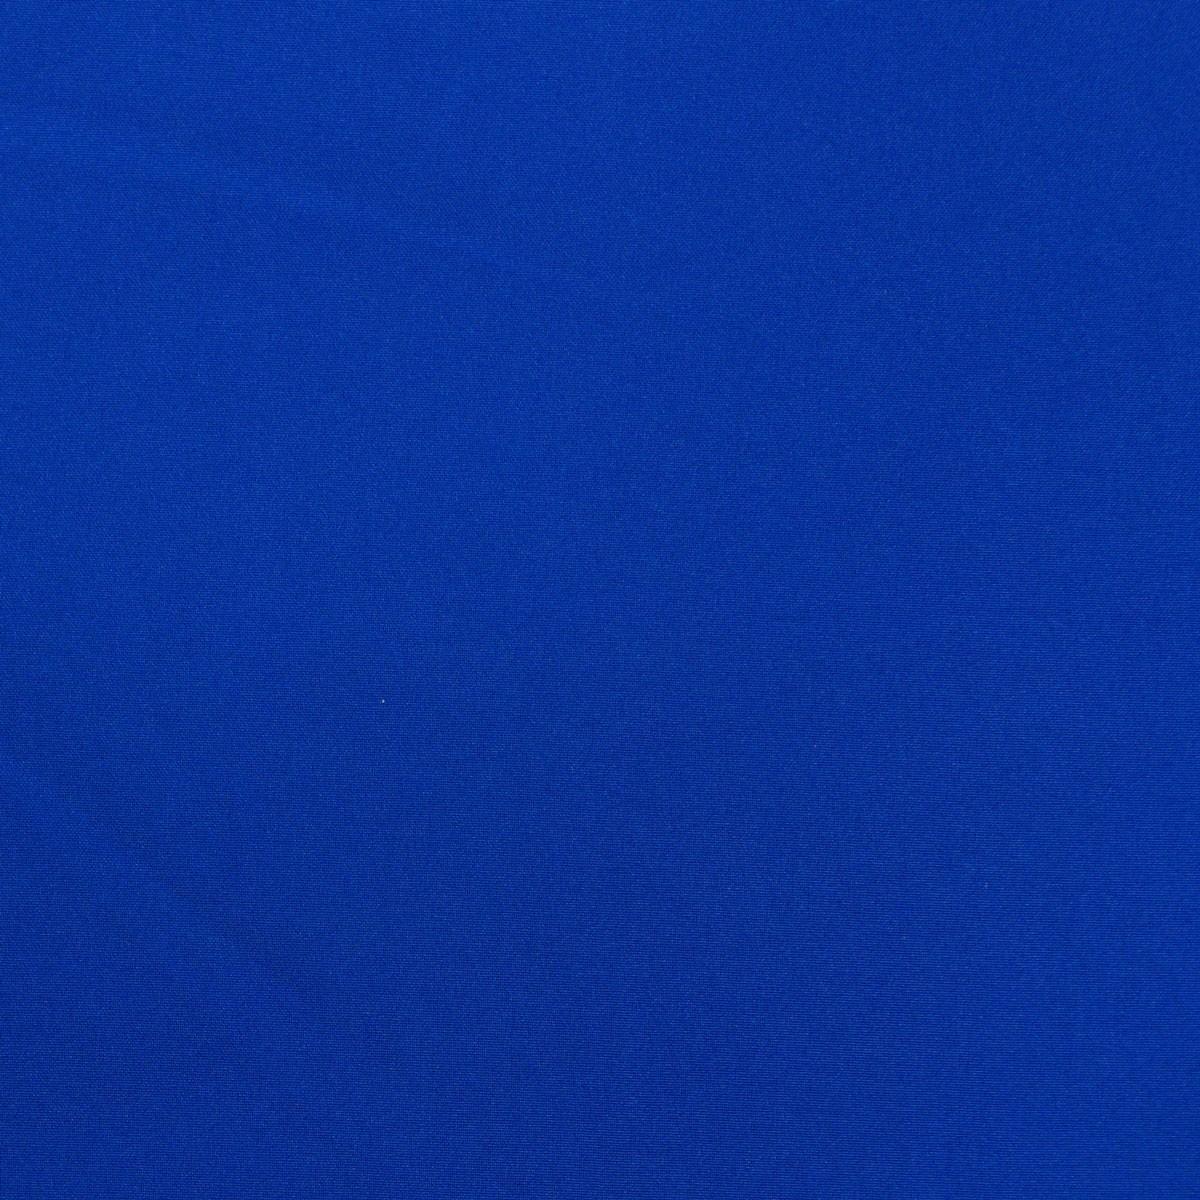 Kreativstoff Universalstoff Polyester Stretch königsblau blau